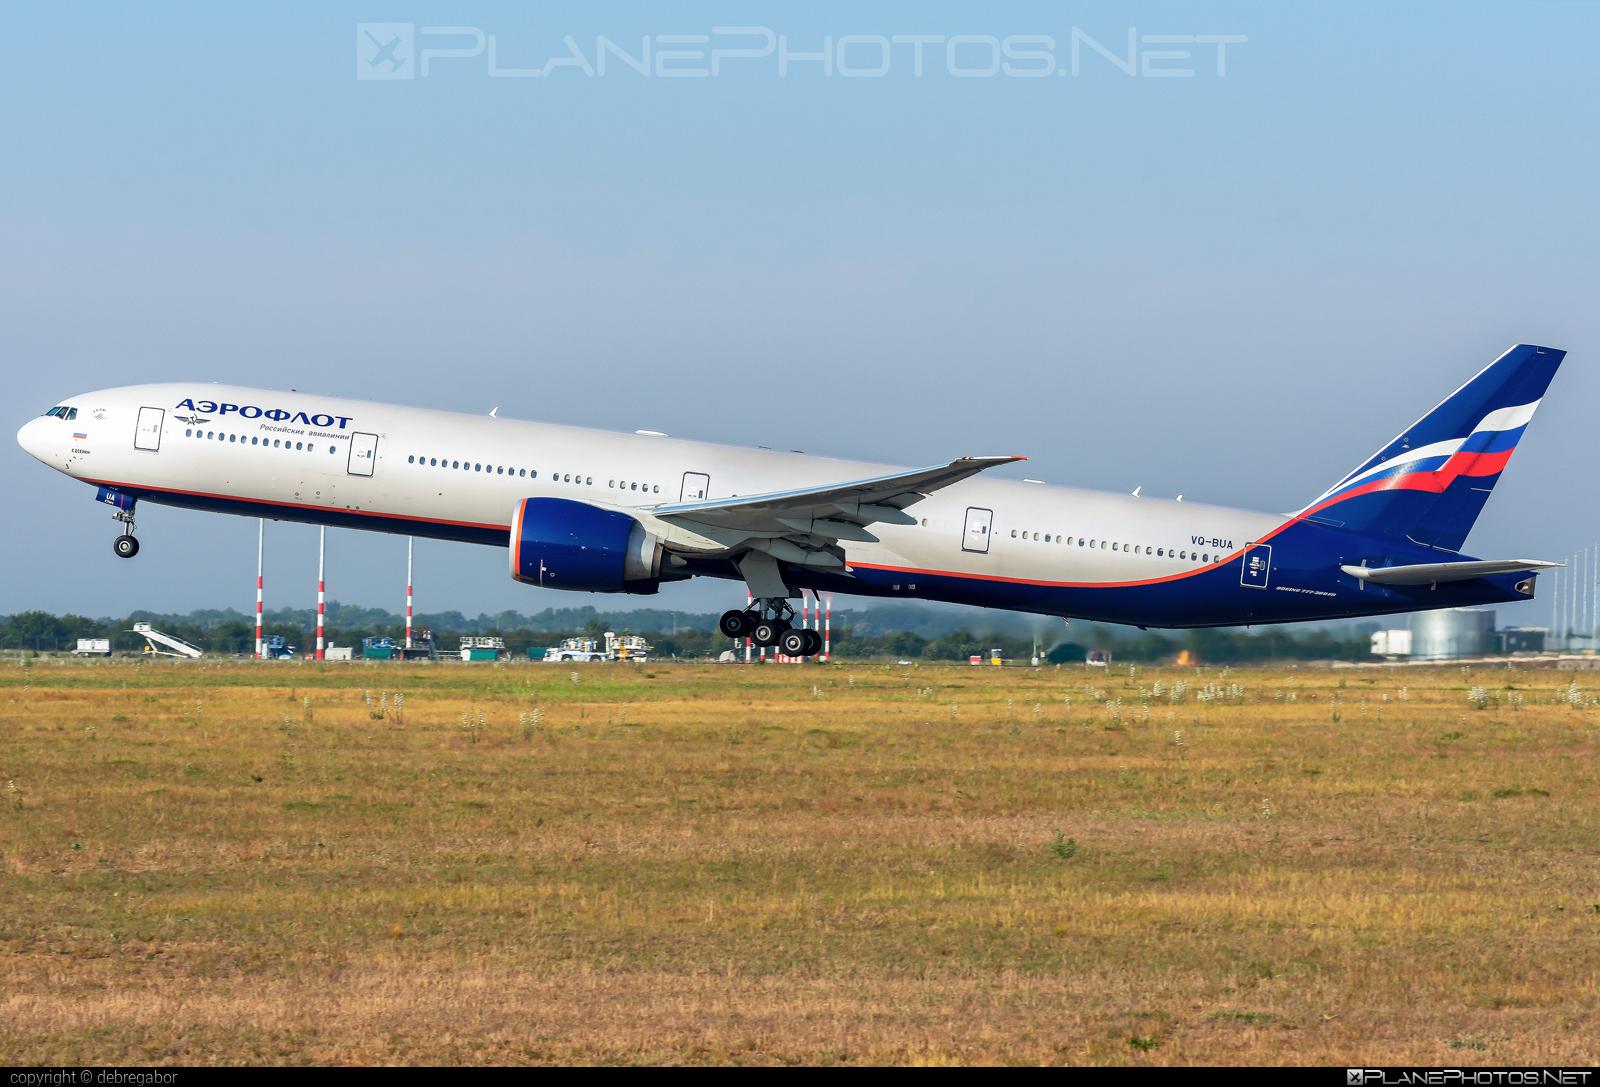 Boeing 777-300ER - VQ-BUA operated by Aeroflot #aeroflot #b777 #b777er #boeing #boeing777 #tripleseven